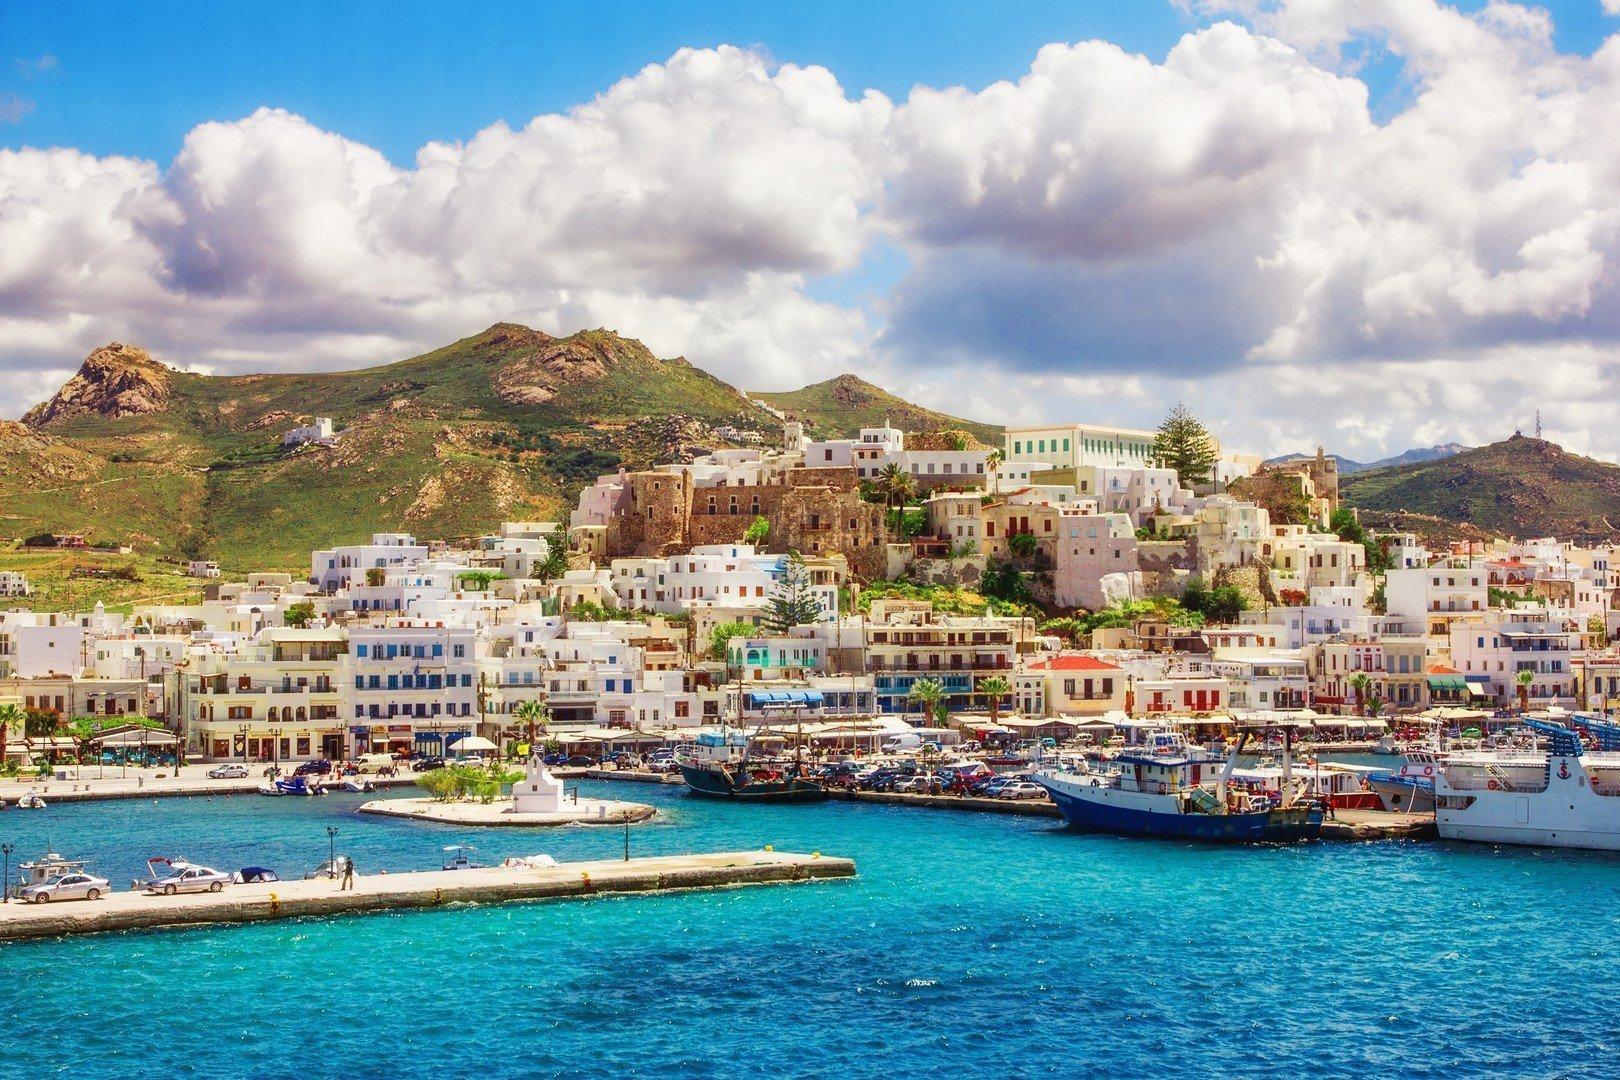 Port on the island of Naxos, Greece shutterstock_188996729